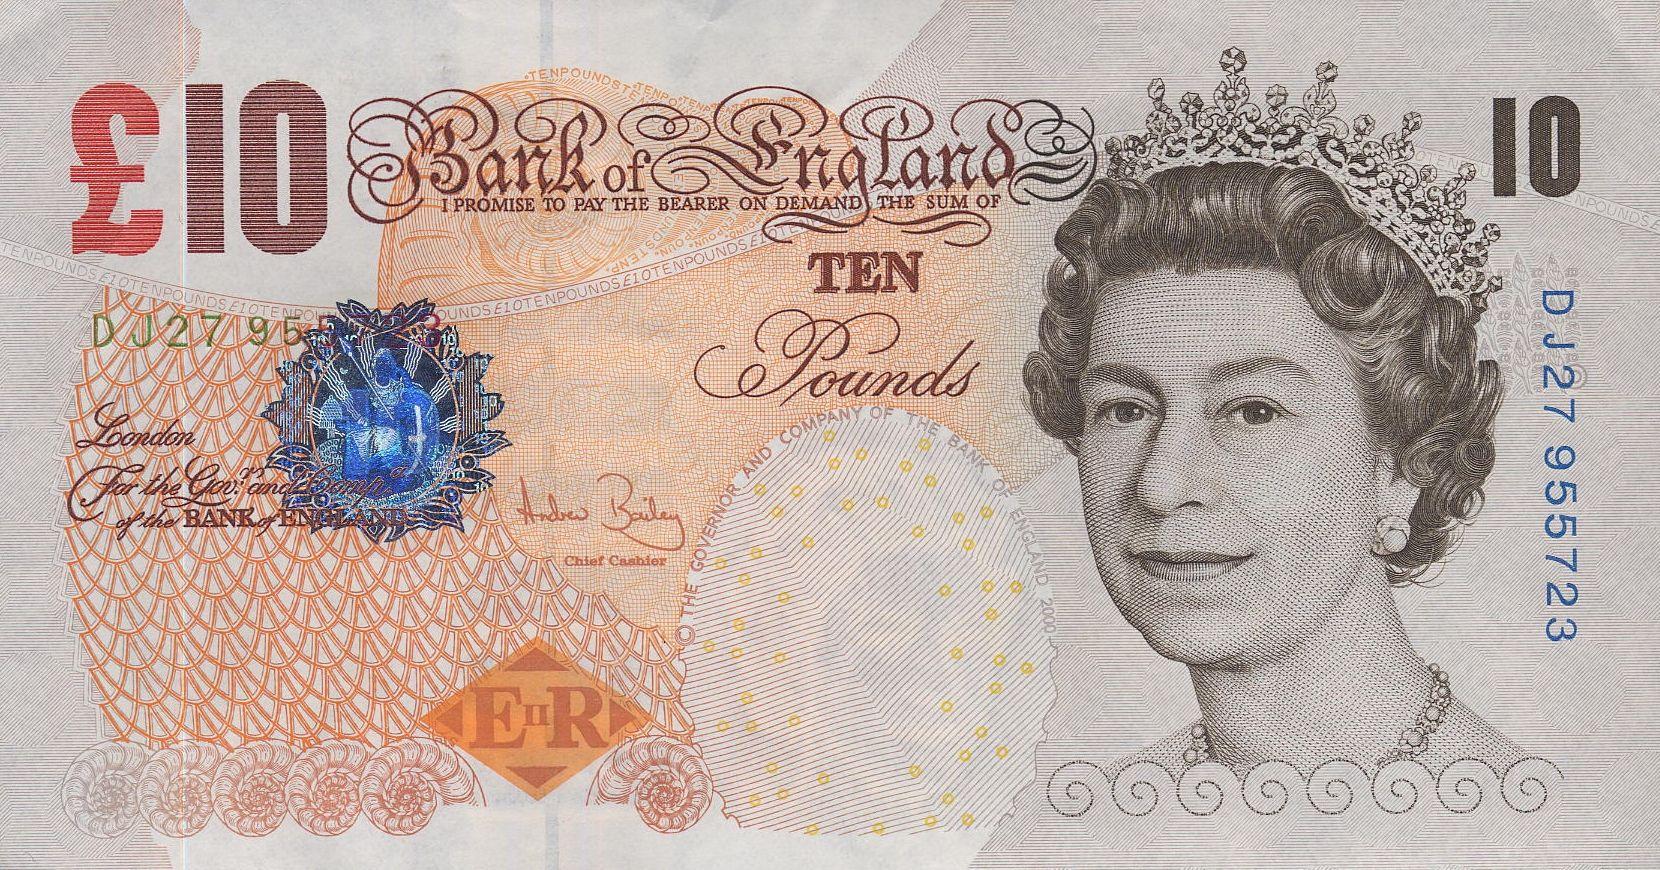 BRAND NEW 2000 10 POUND BANK OF ENGLAND NOTE 1 NOTE** LJ PREFIX